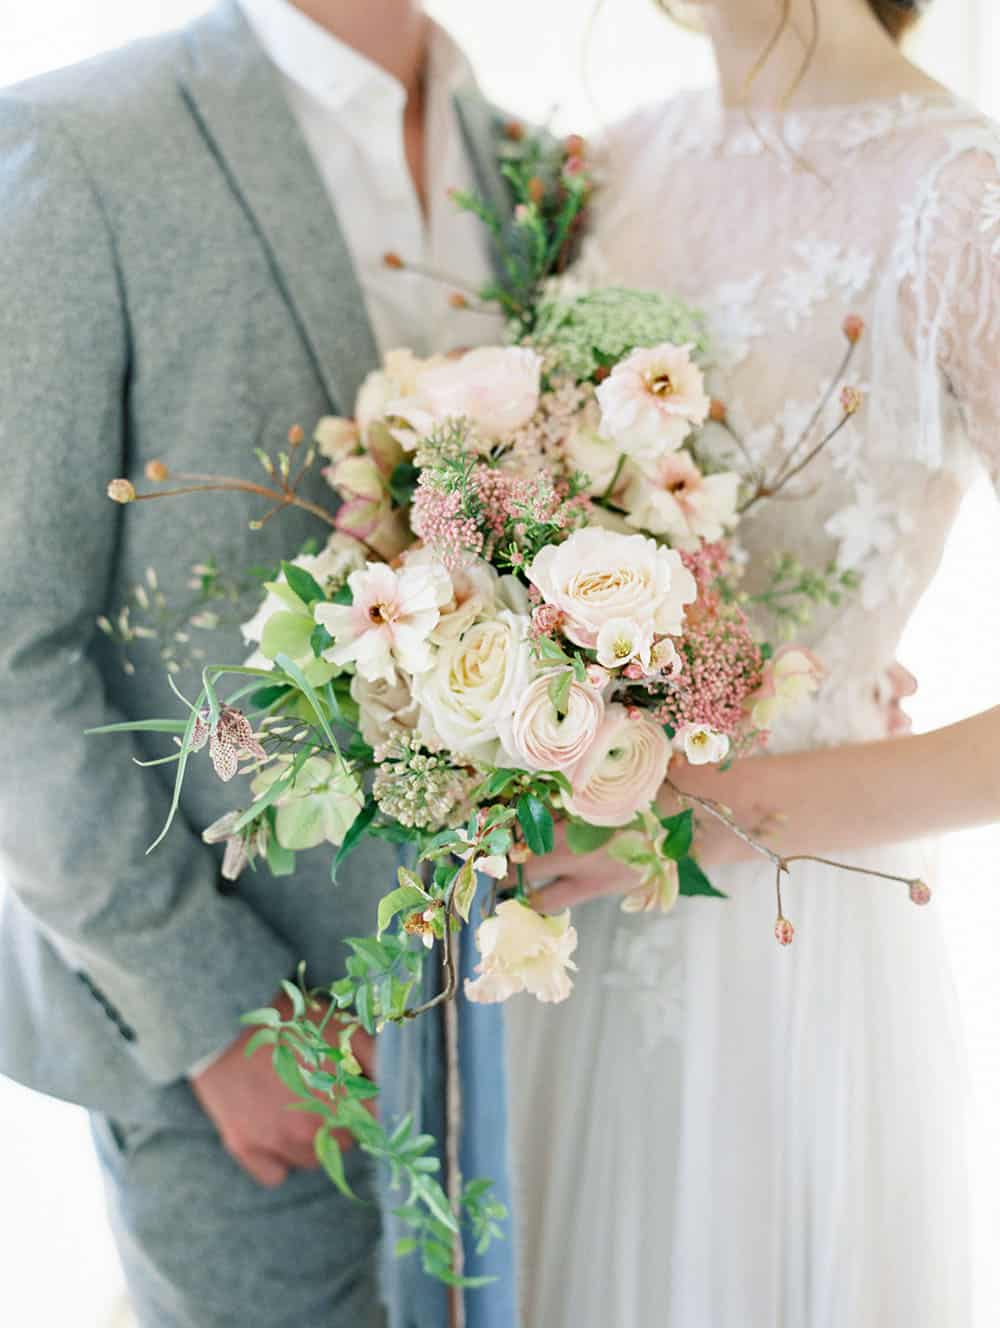 Seasonally Inspired Wedding Flowers With A Goddess Of Spring Bridal Look Ruffled